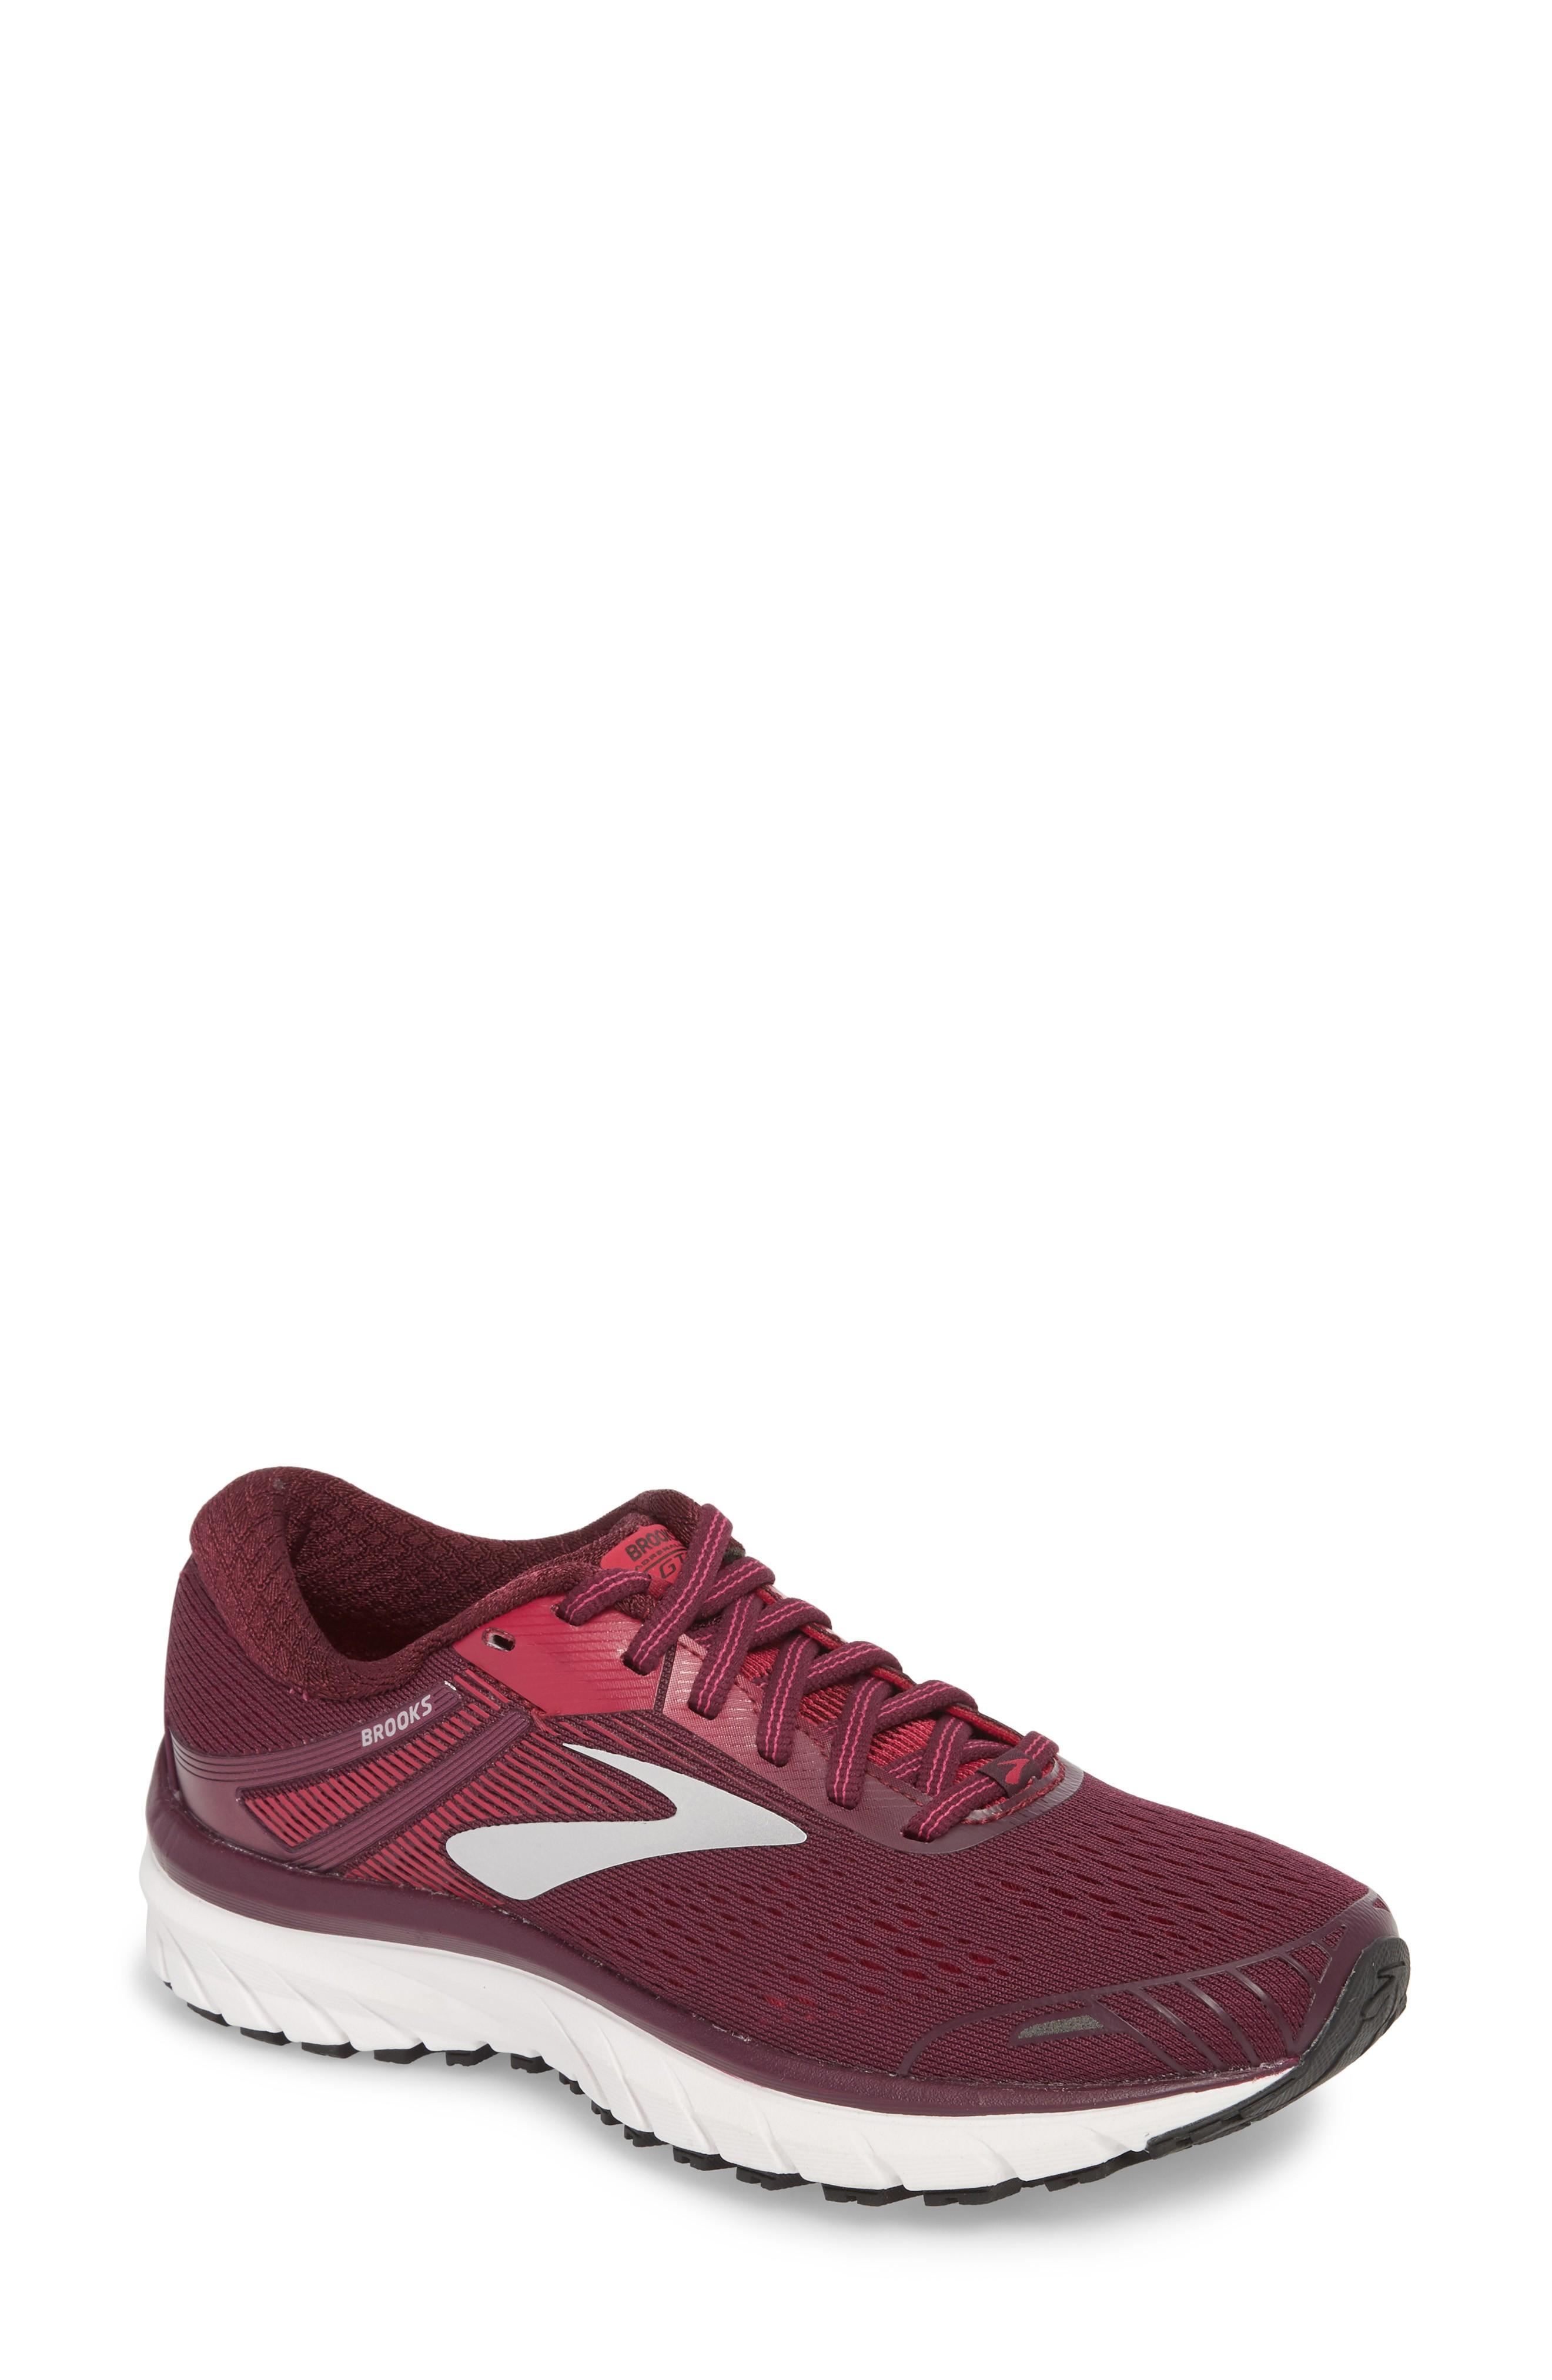 d54dd315bbc07 Brooks Adrenaline Gts 18 Running Shoe In Purple  Pink  Silver